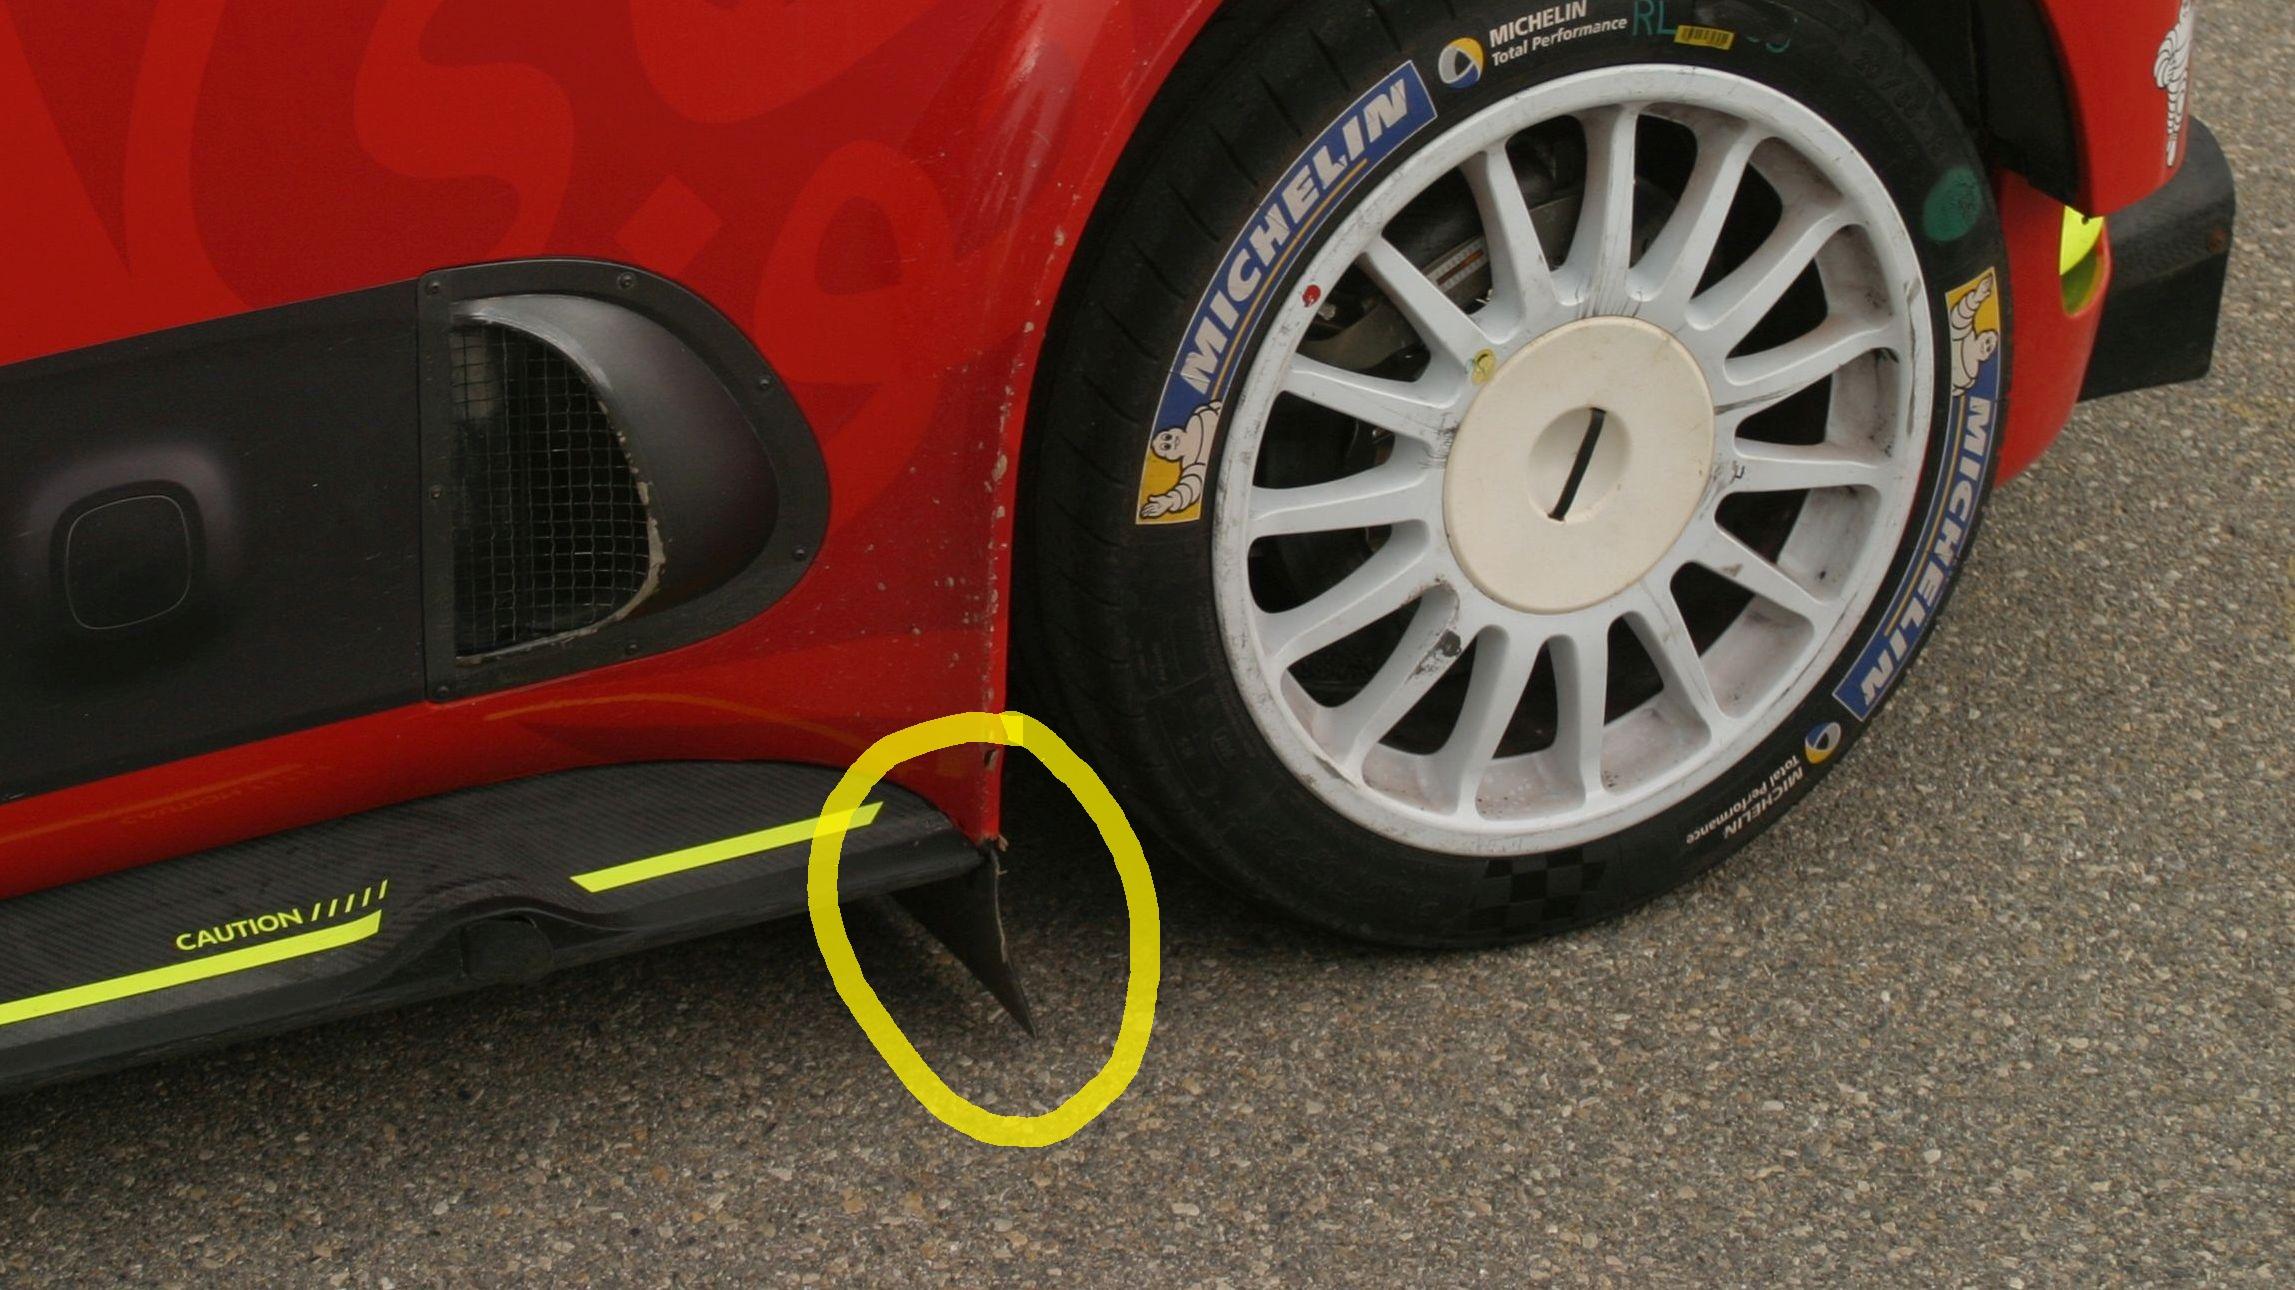 al qassimi catalunya rear flap detailed.jpg